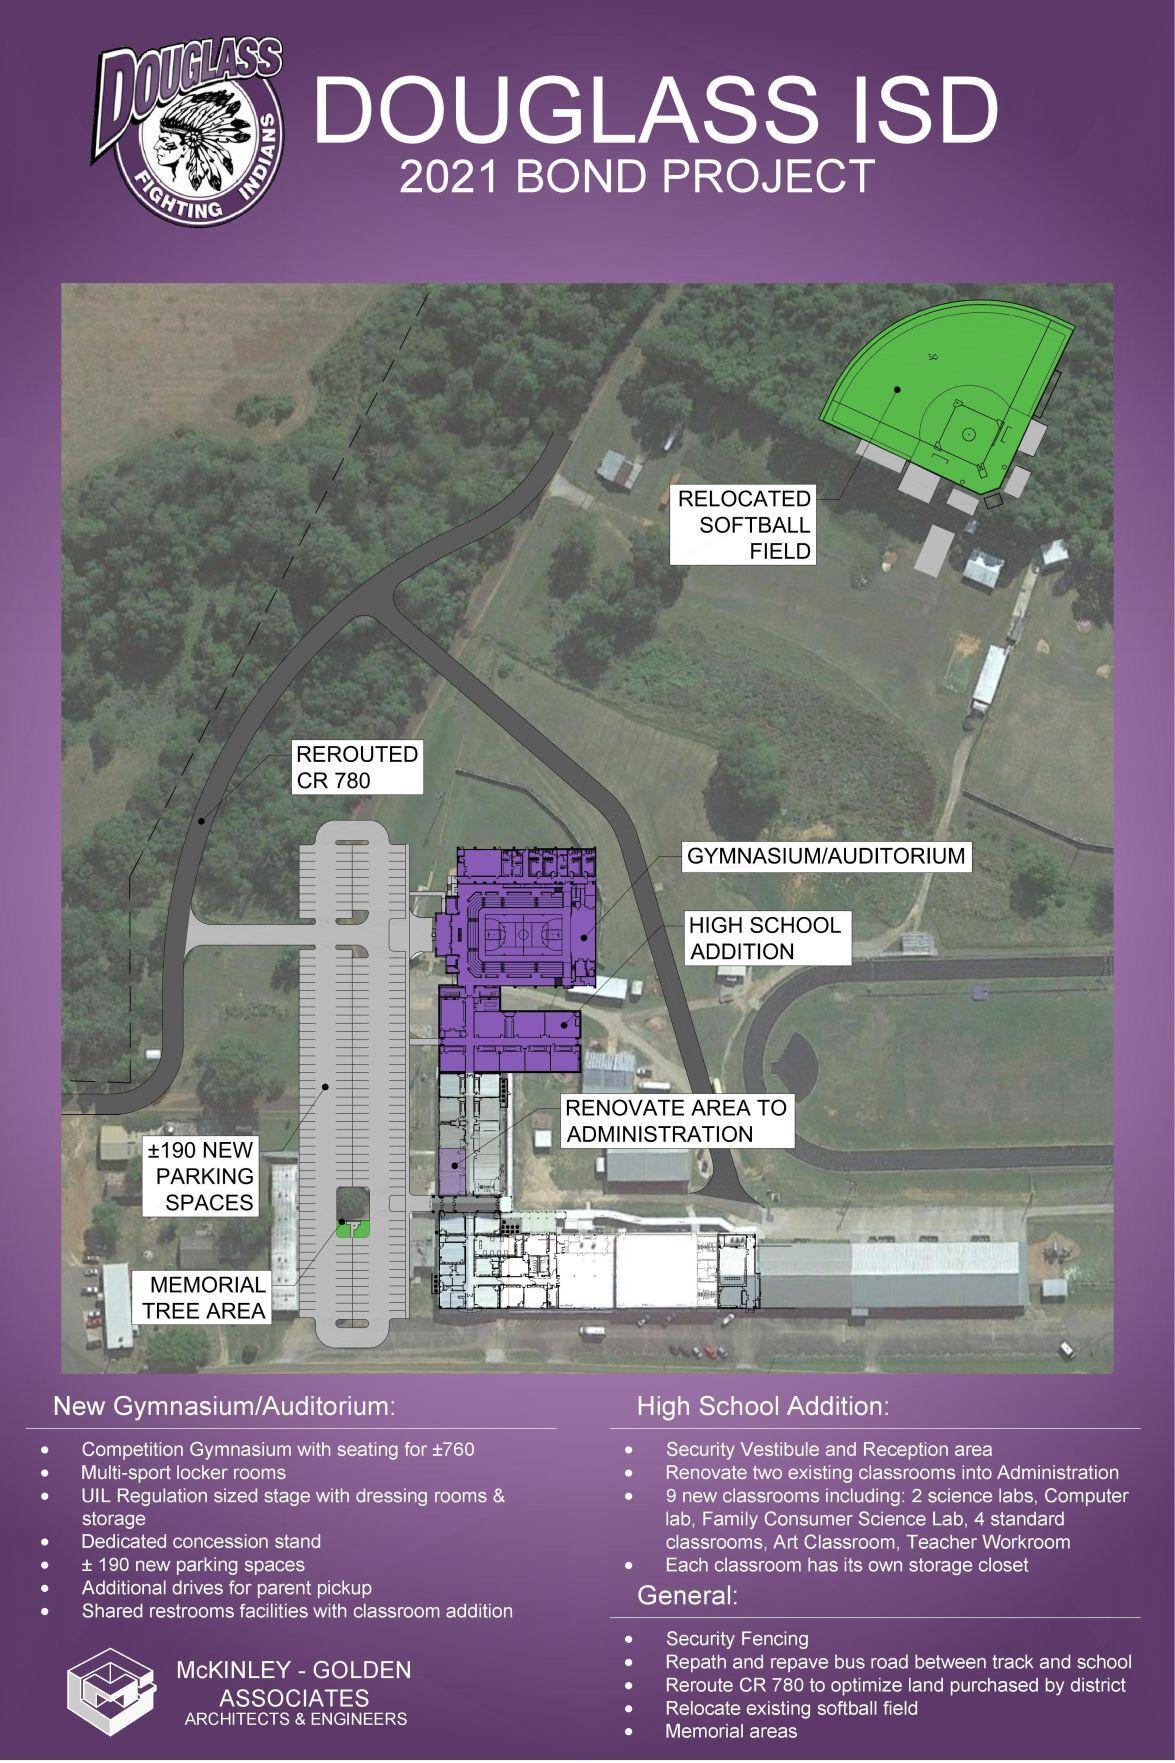 DouglassISD site plan